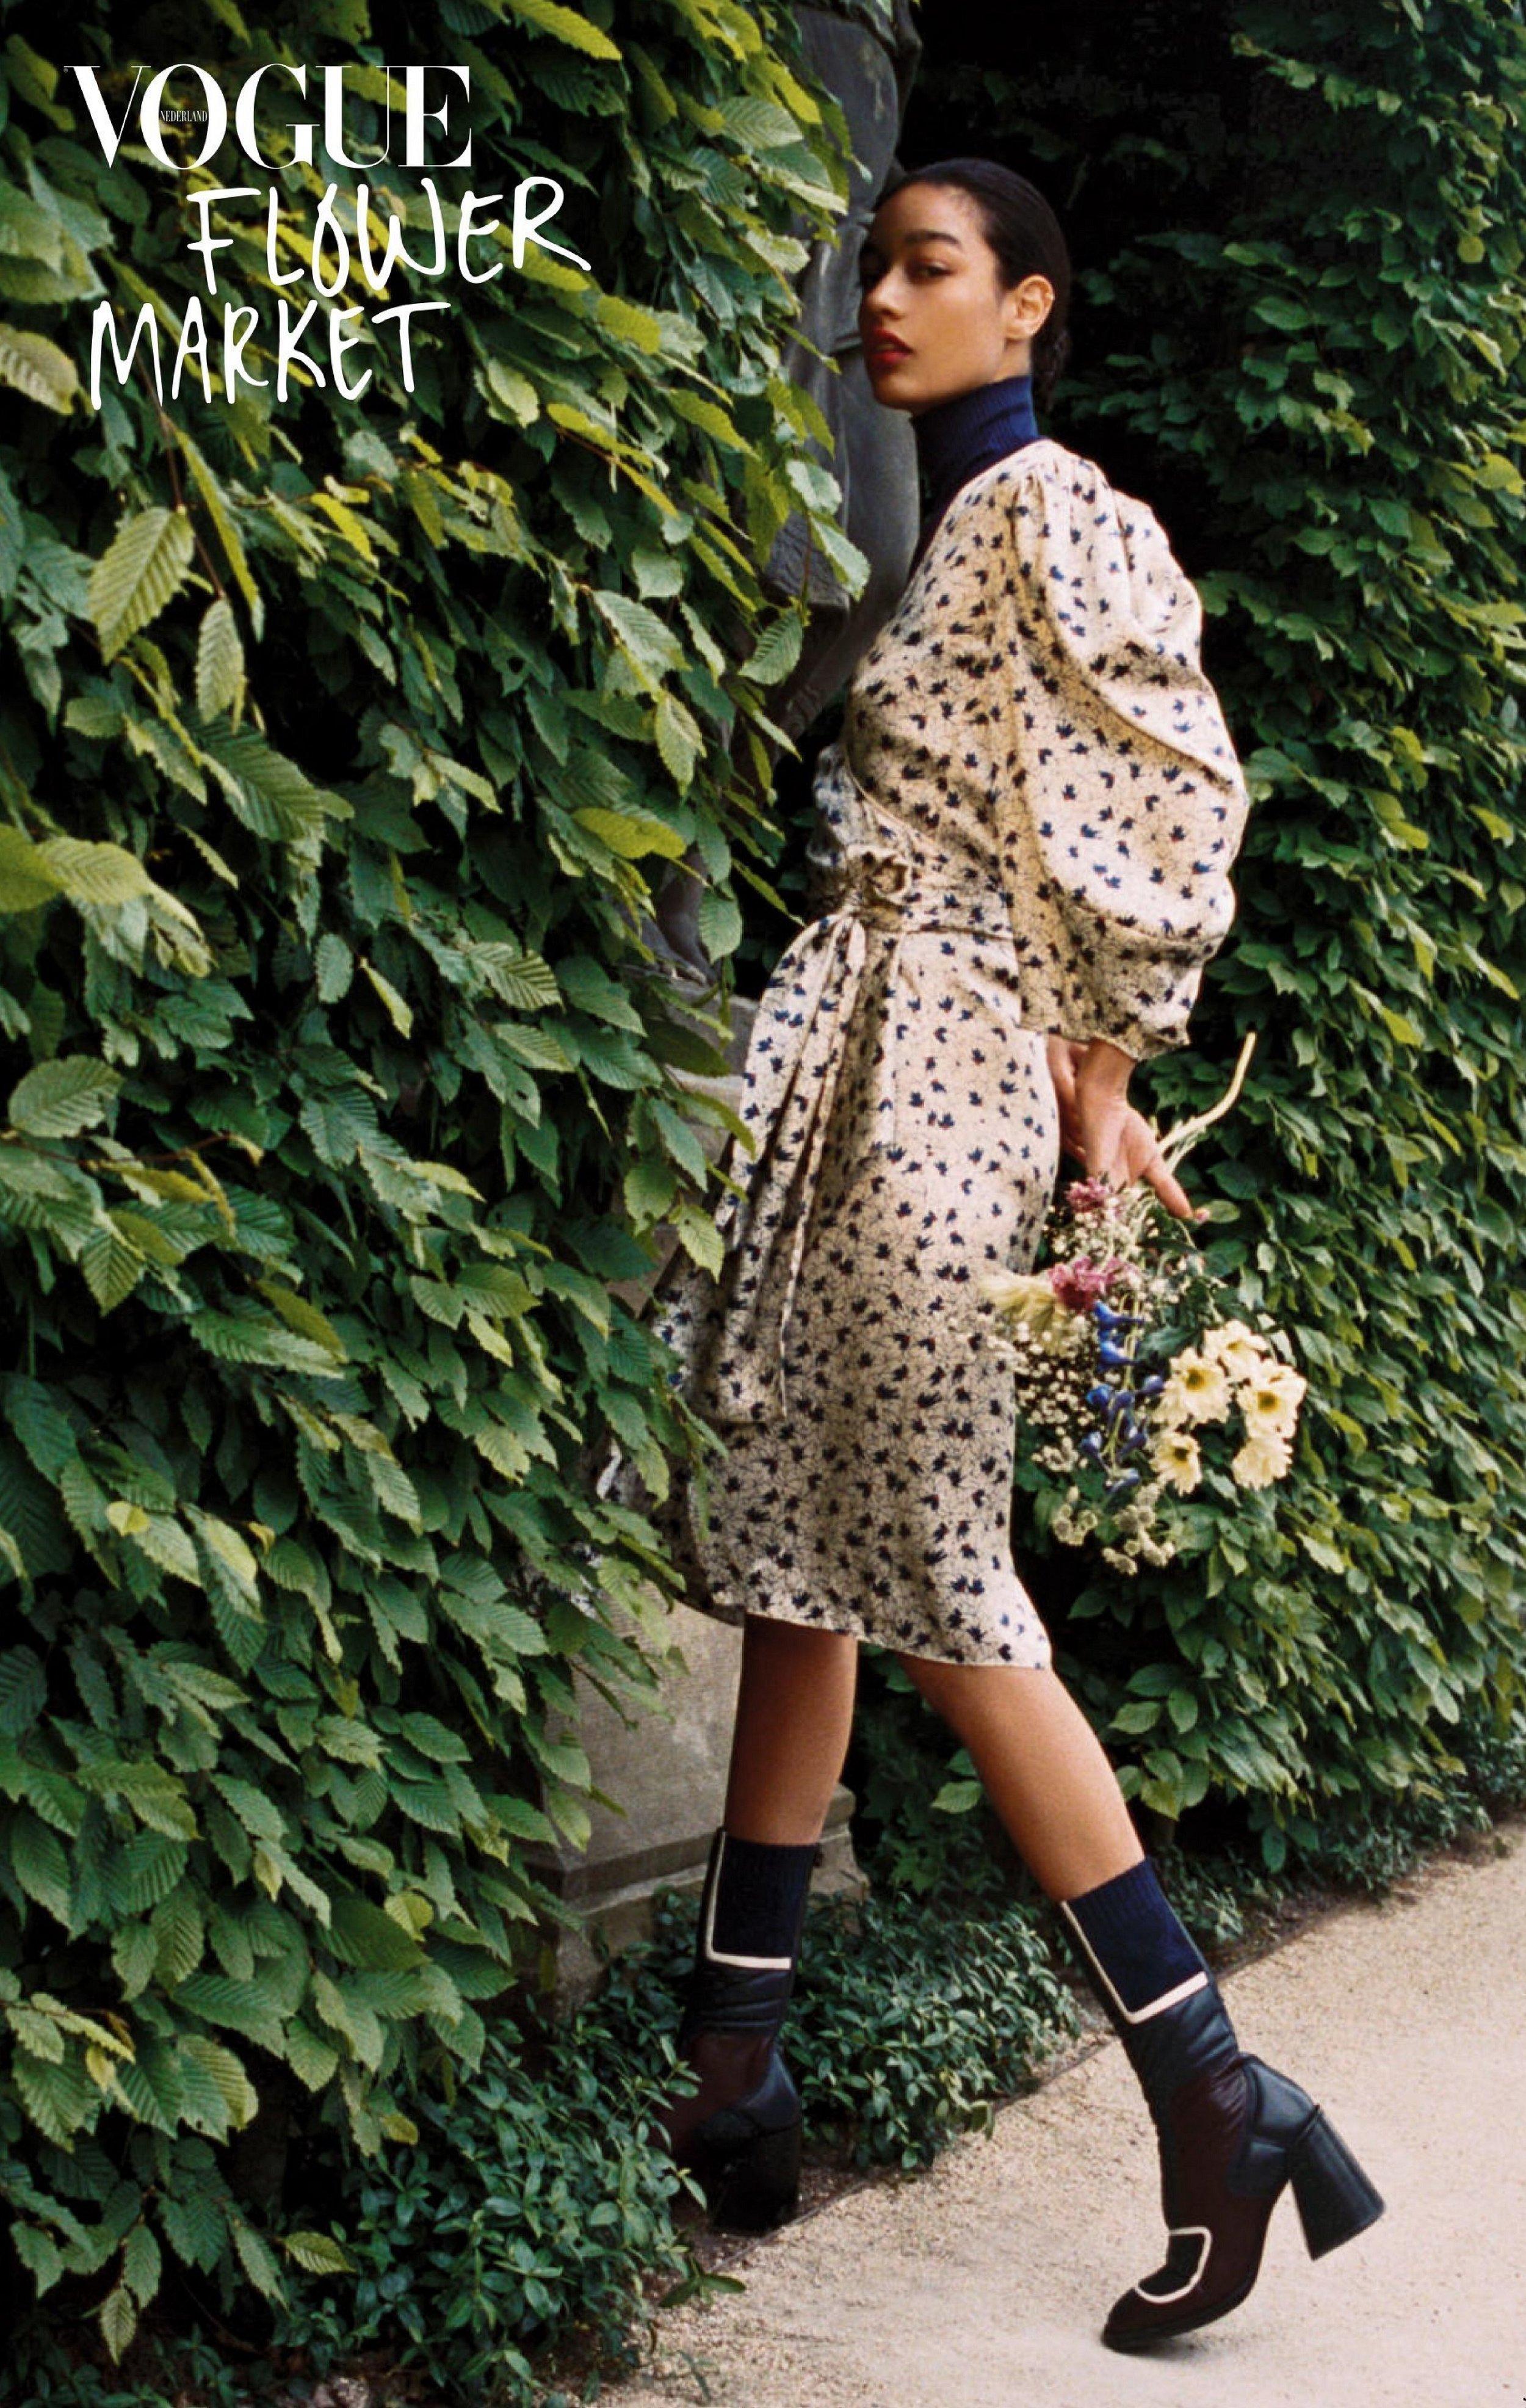 Damaris Goddrie by Walter Perre for Vogue Netherlands Sept 2019 (4) crop.jpg